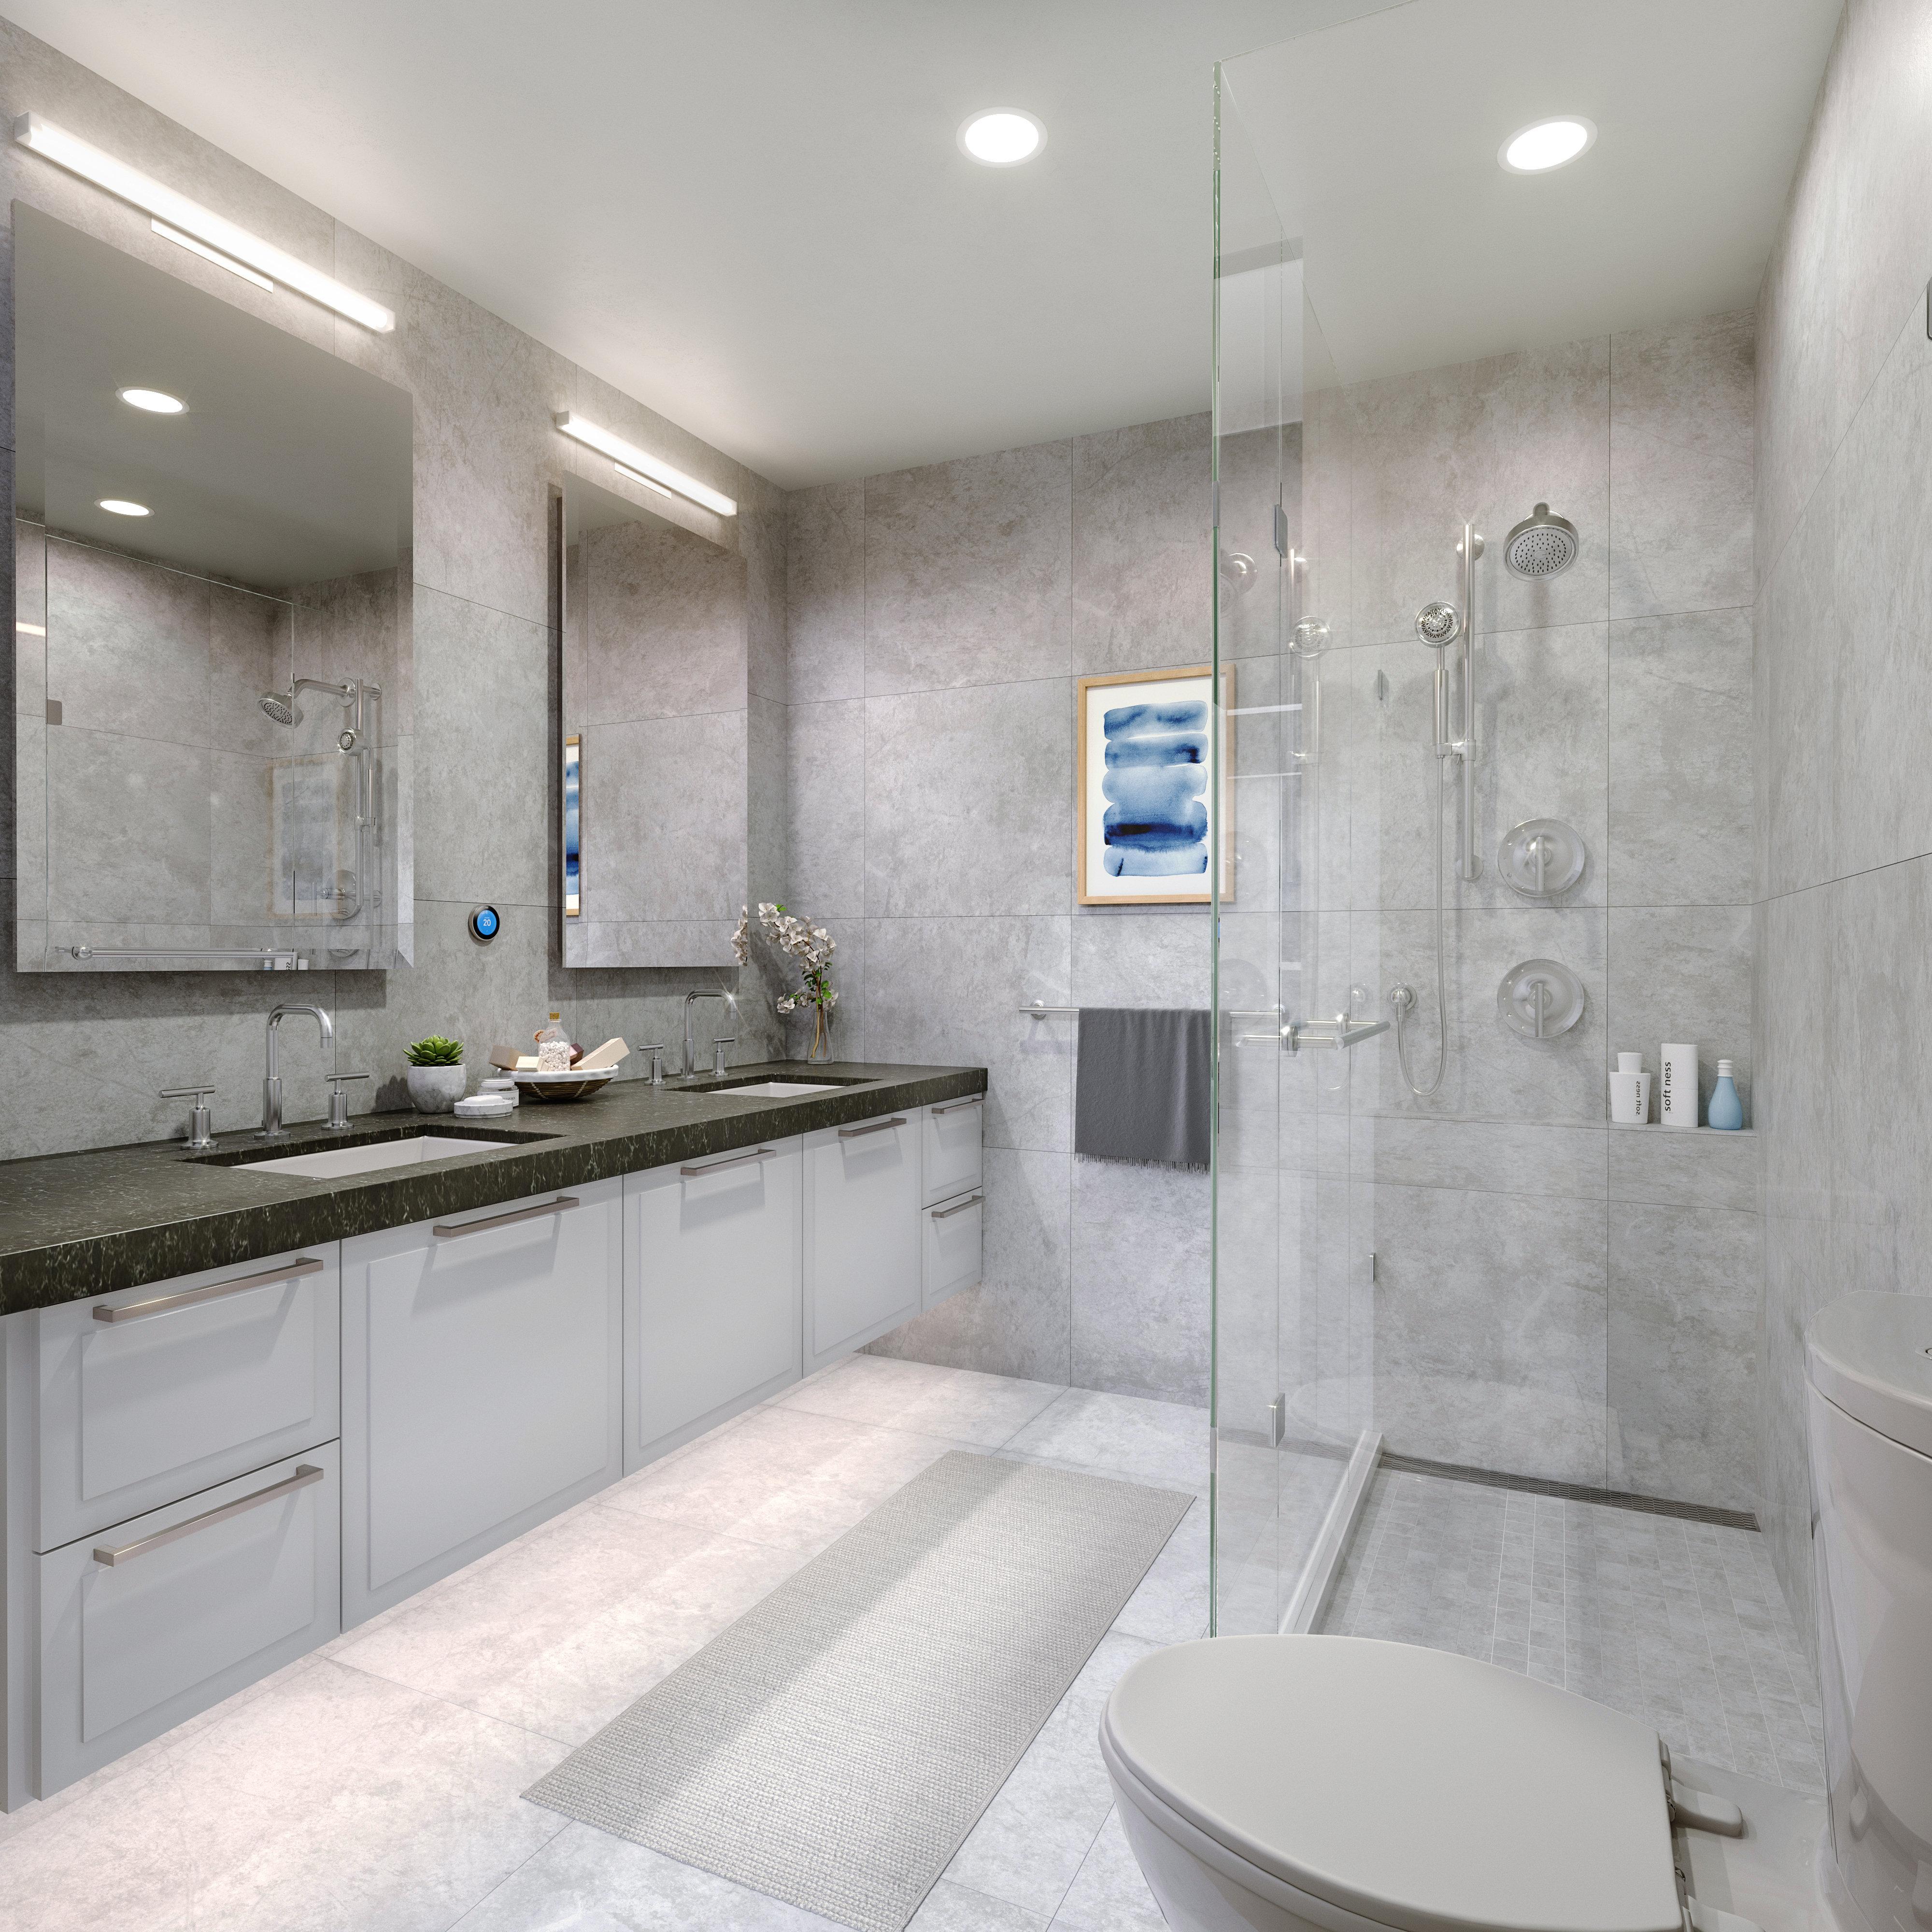 Bathroom - 7878 Granville St, Vancouver, BC V6P 4Z2, Canada!